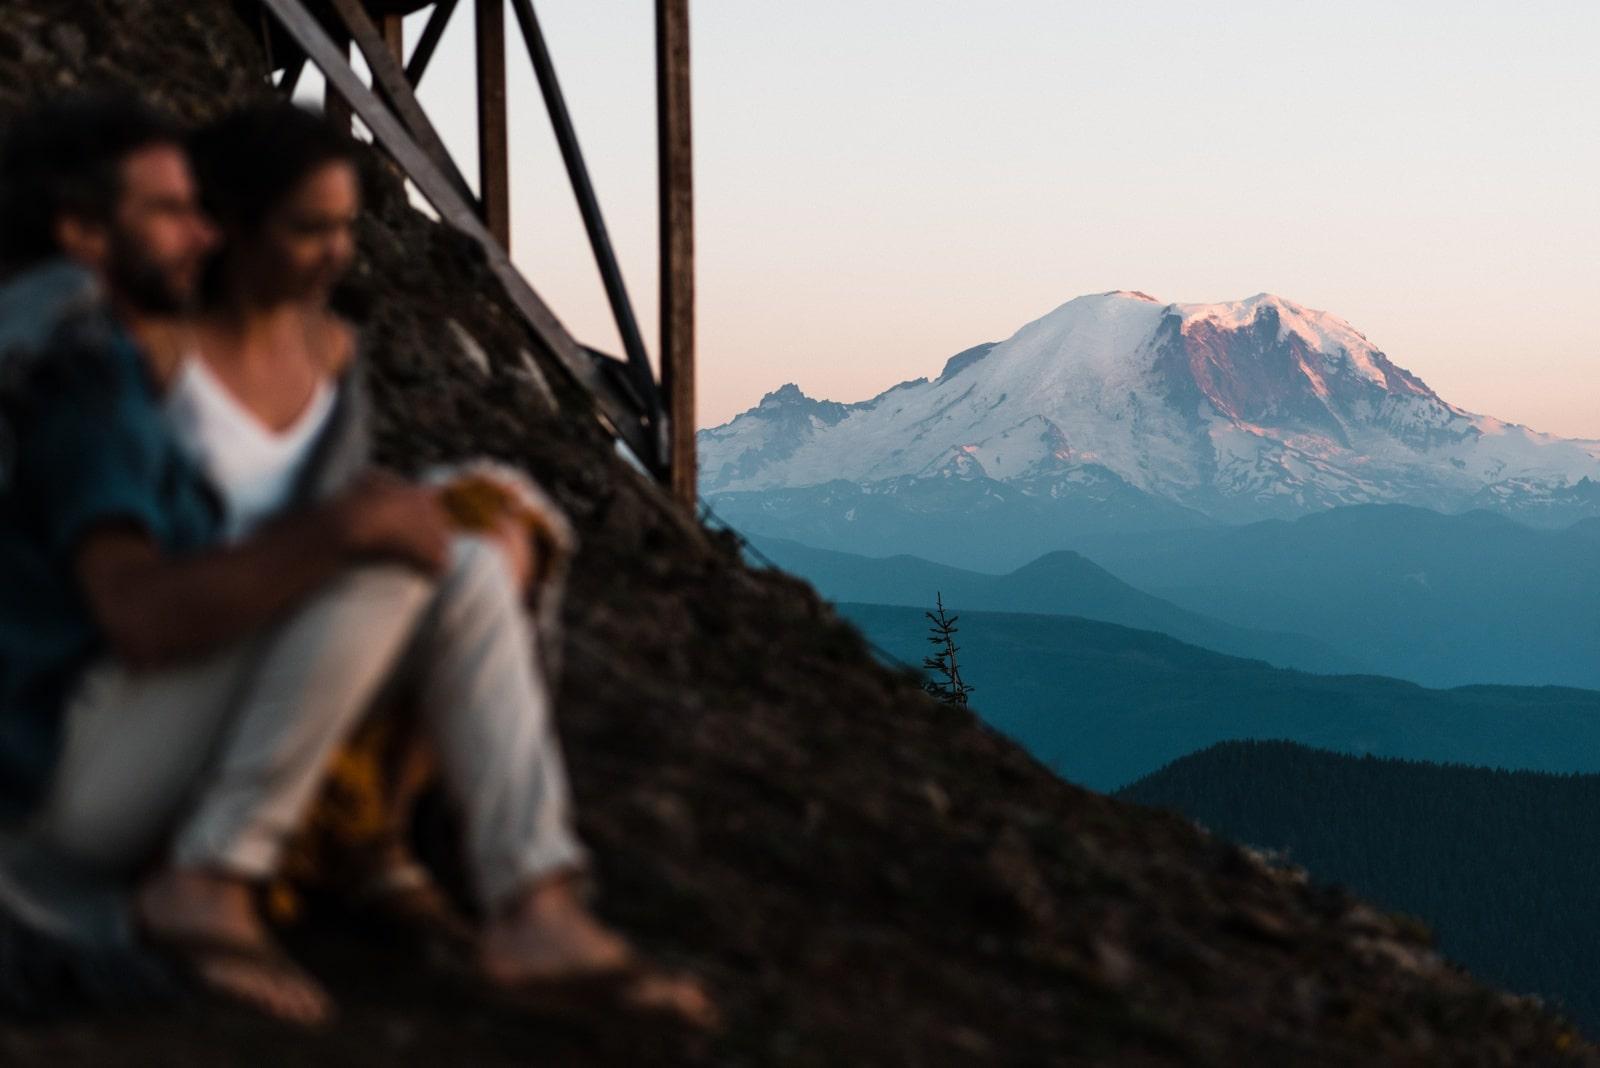 Mt Rainier Engagement Photo Shoot at Sunset Fire Lookout